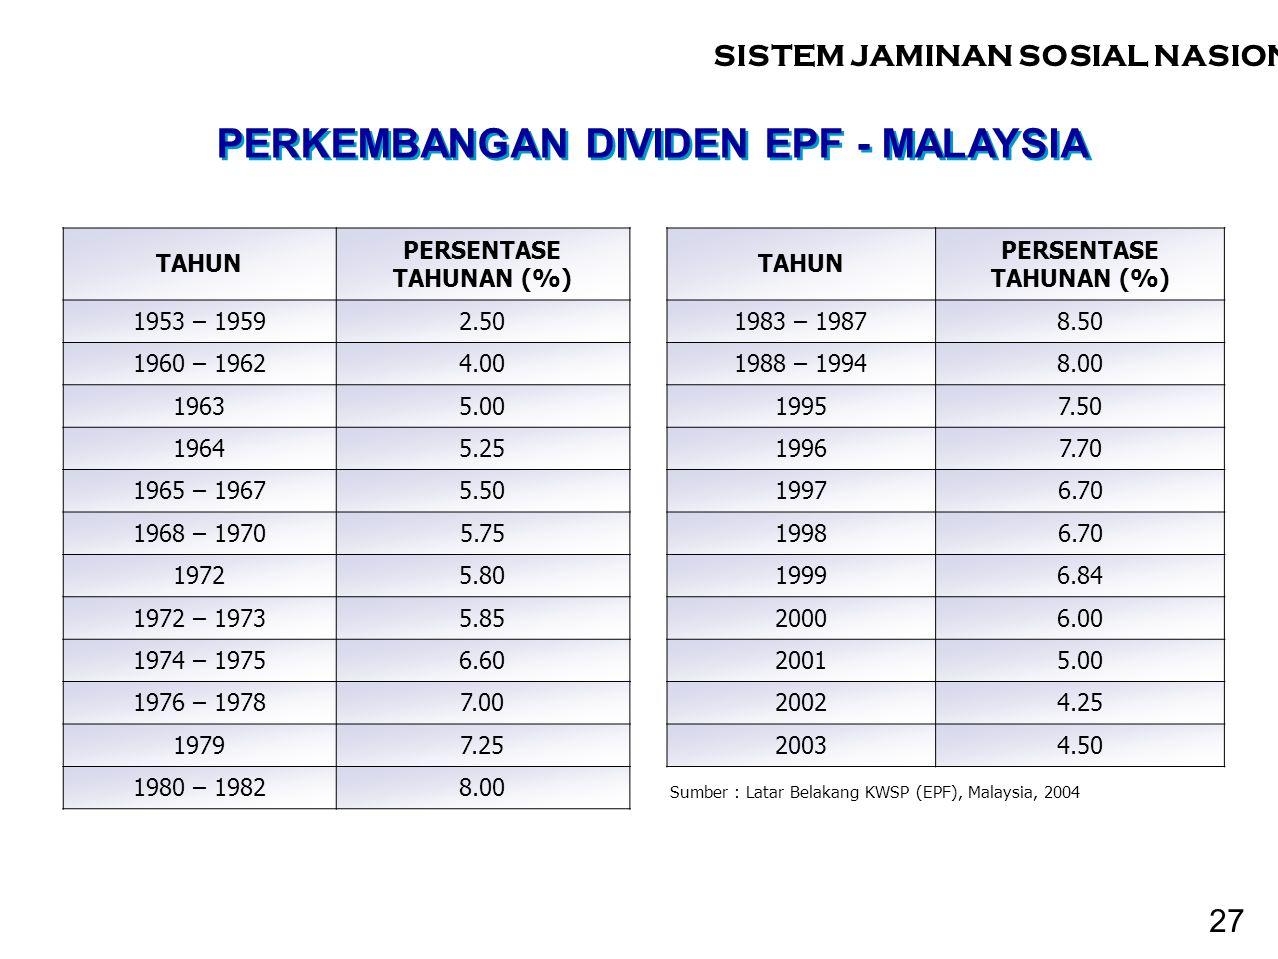 PERKEMBANGAN DIVIDEN EPF - MALAYSIA